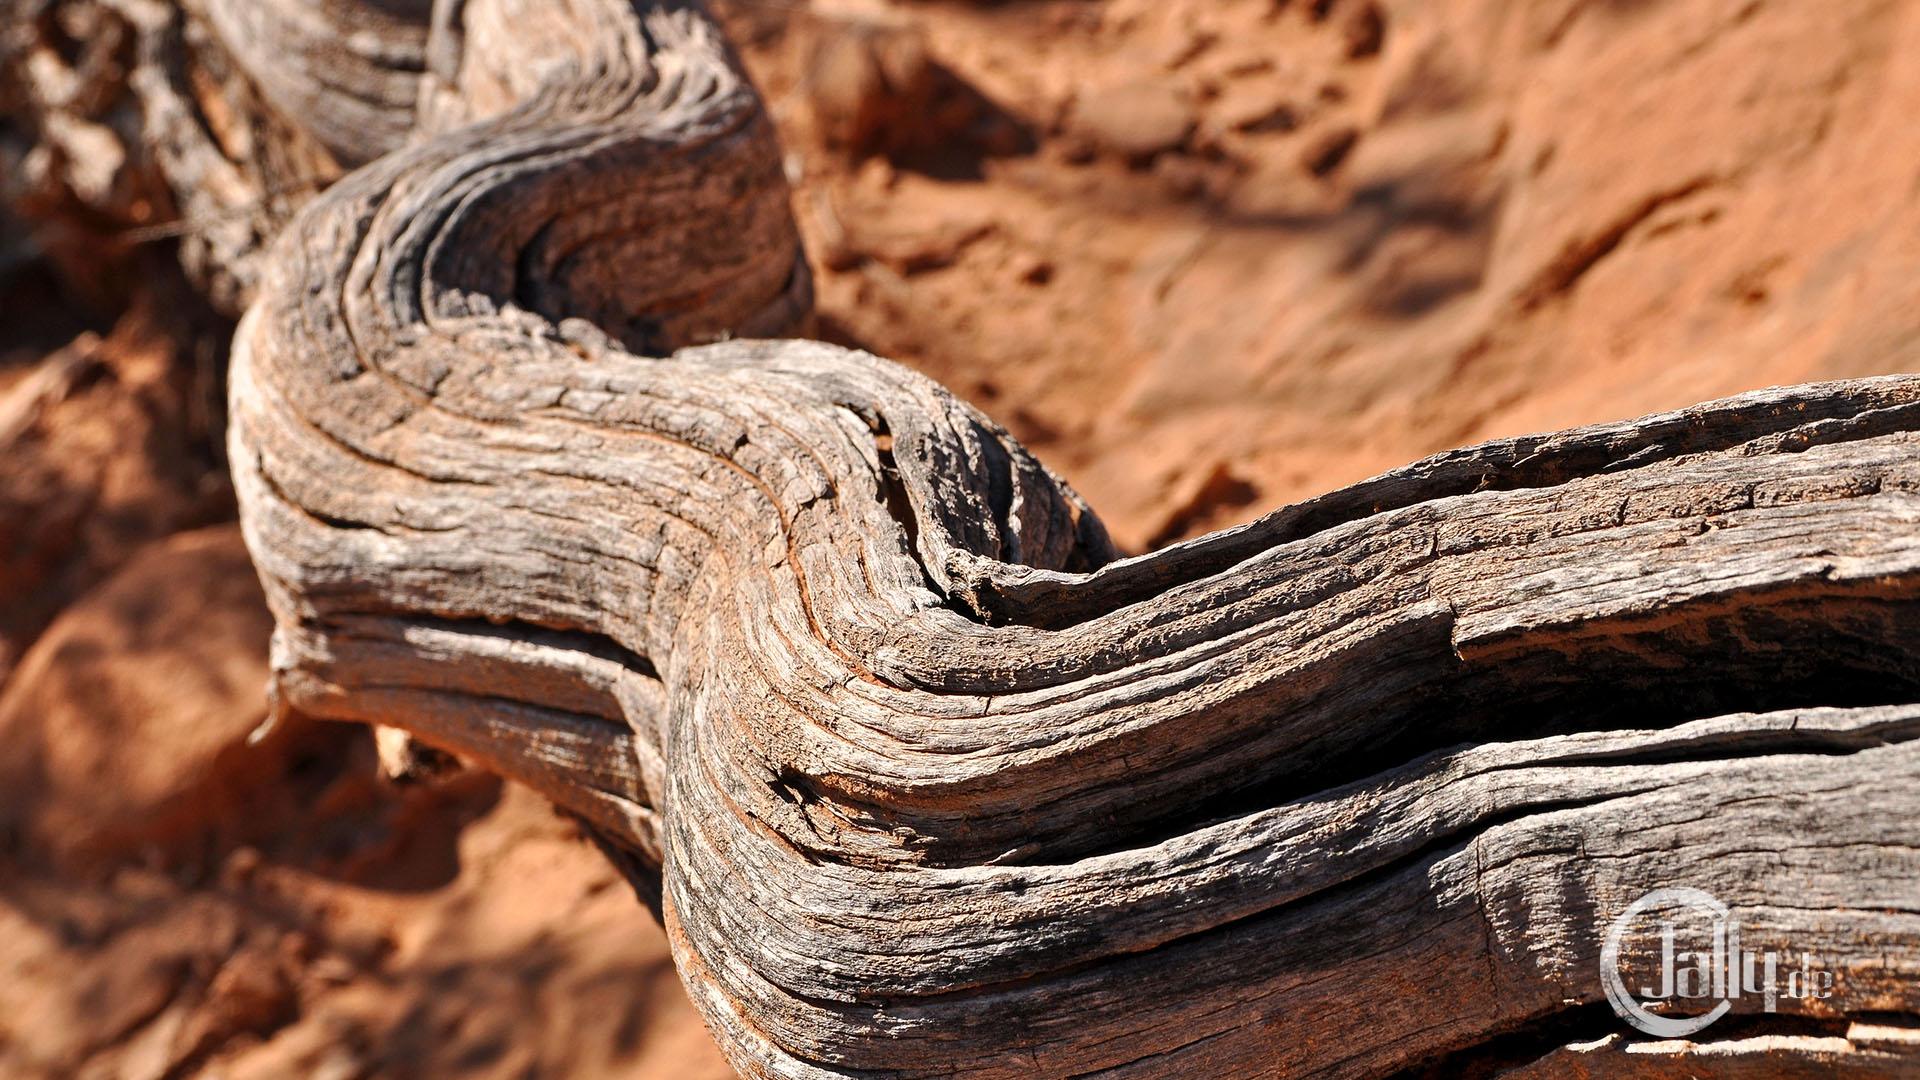 USA / Escalante / Art Dry wood in desert wallpaper